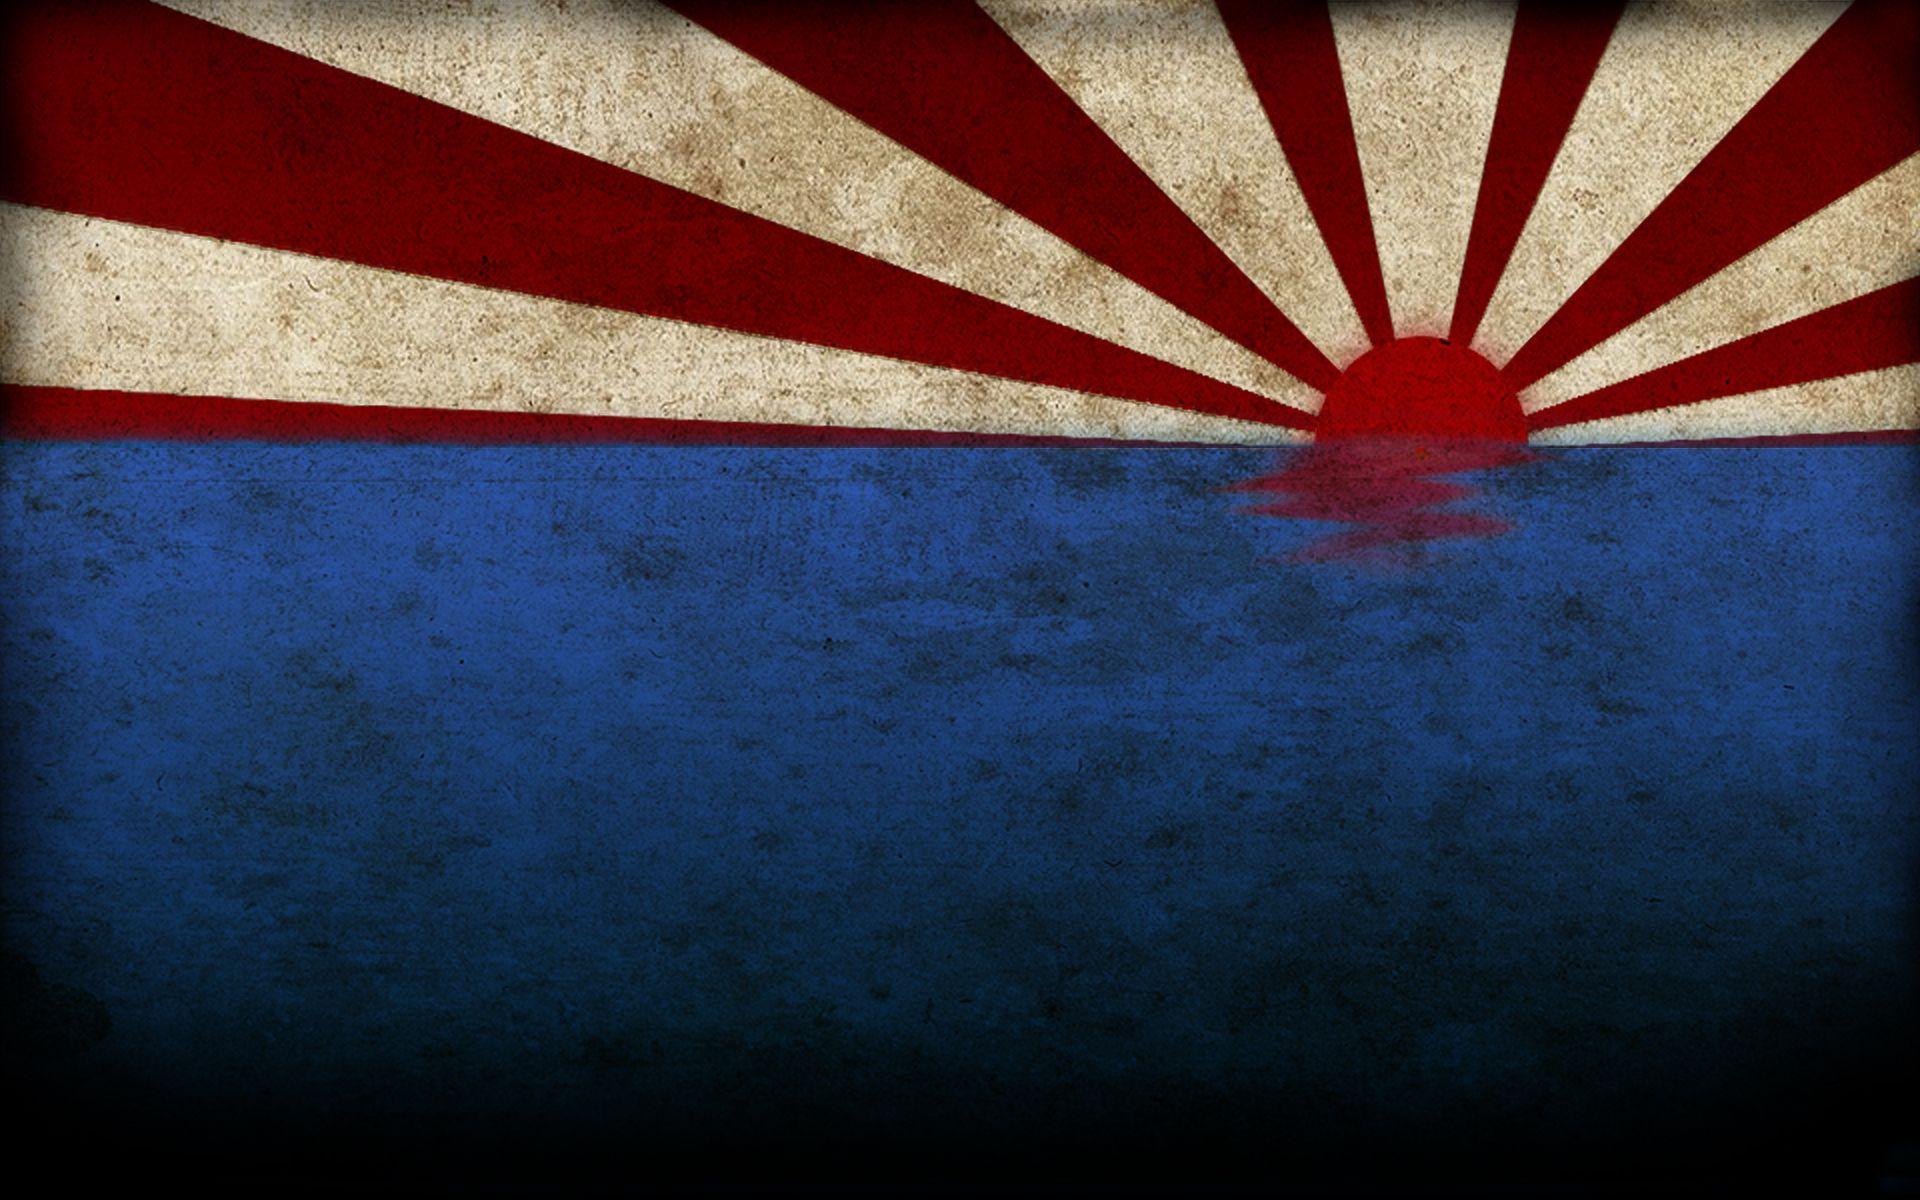 Japanese Rising Sun Wallpapers Top Free Japanese Rising Sun